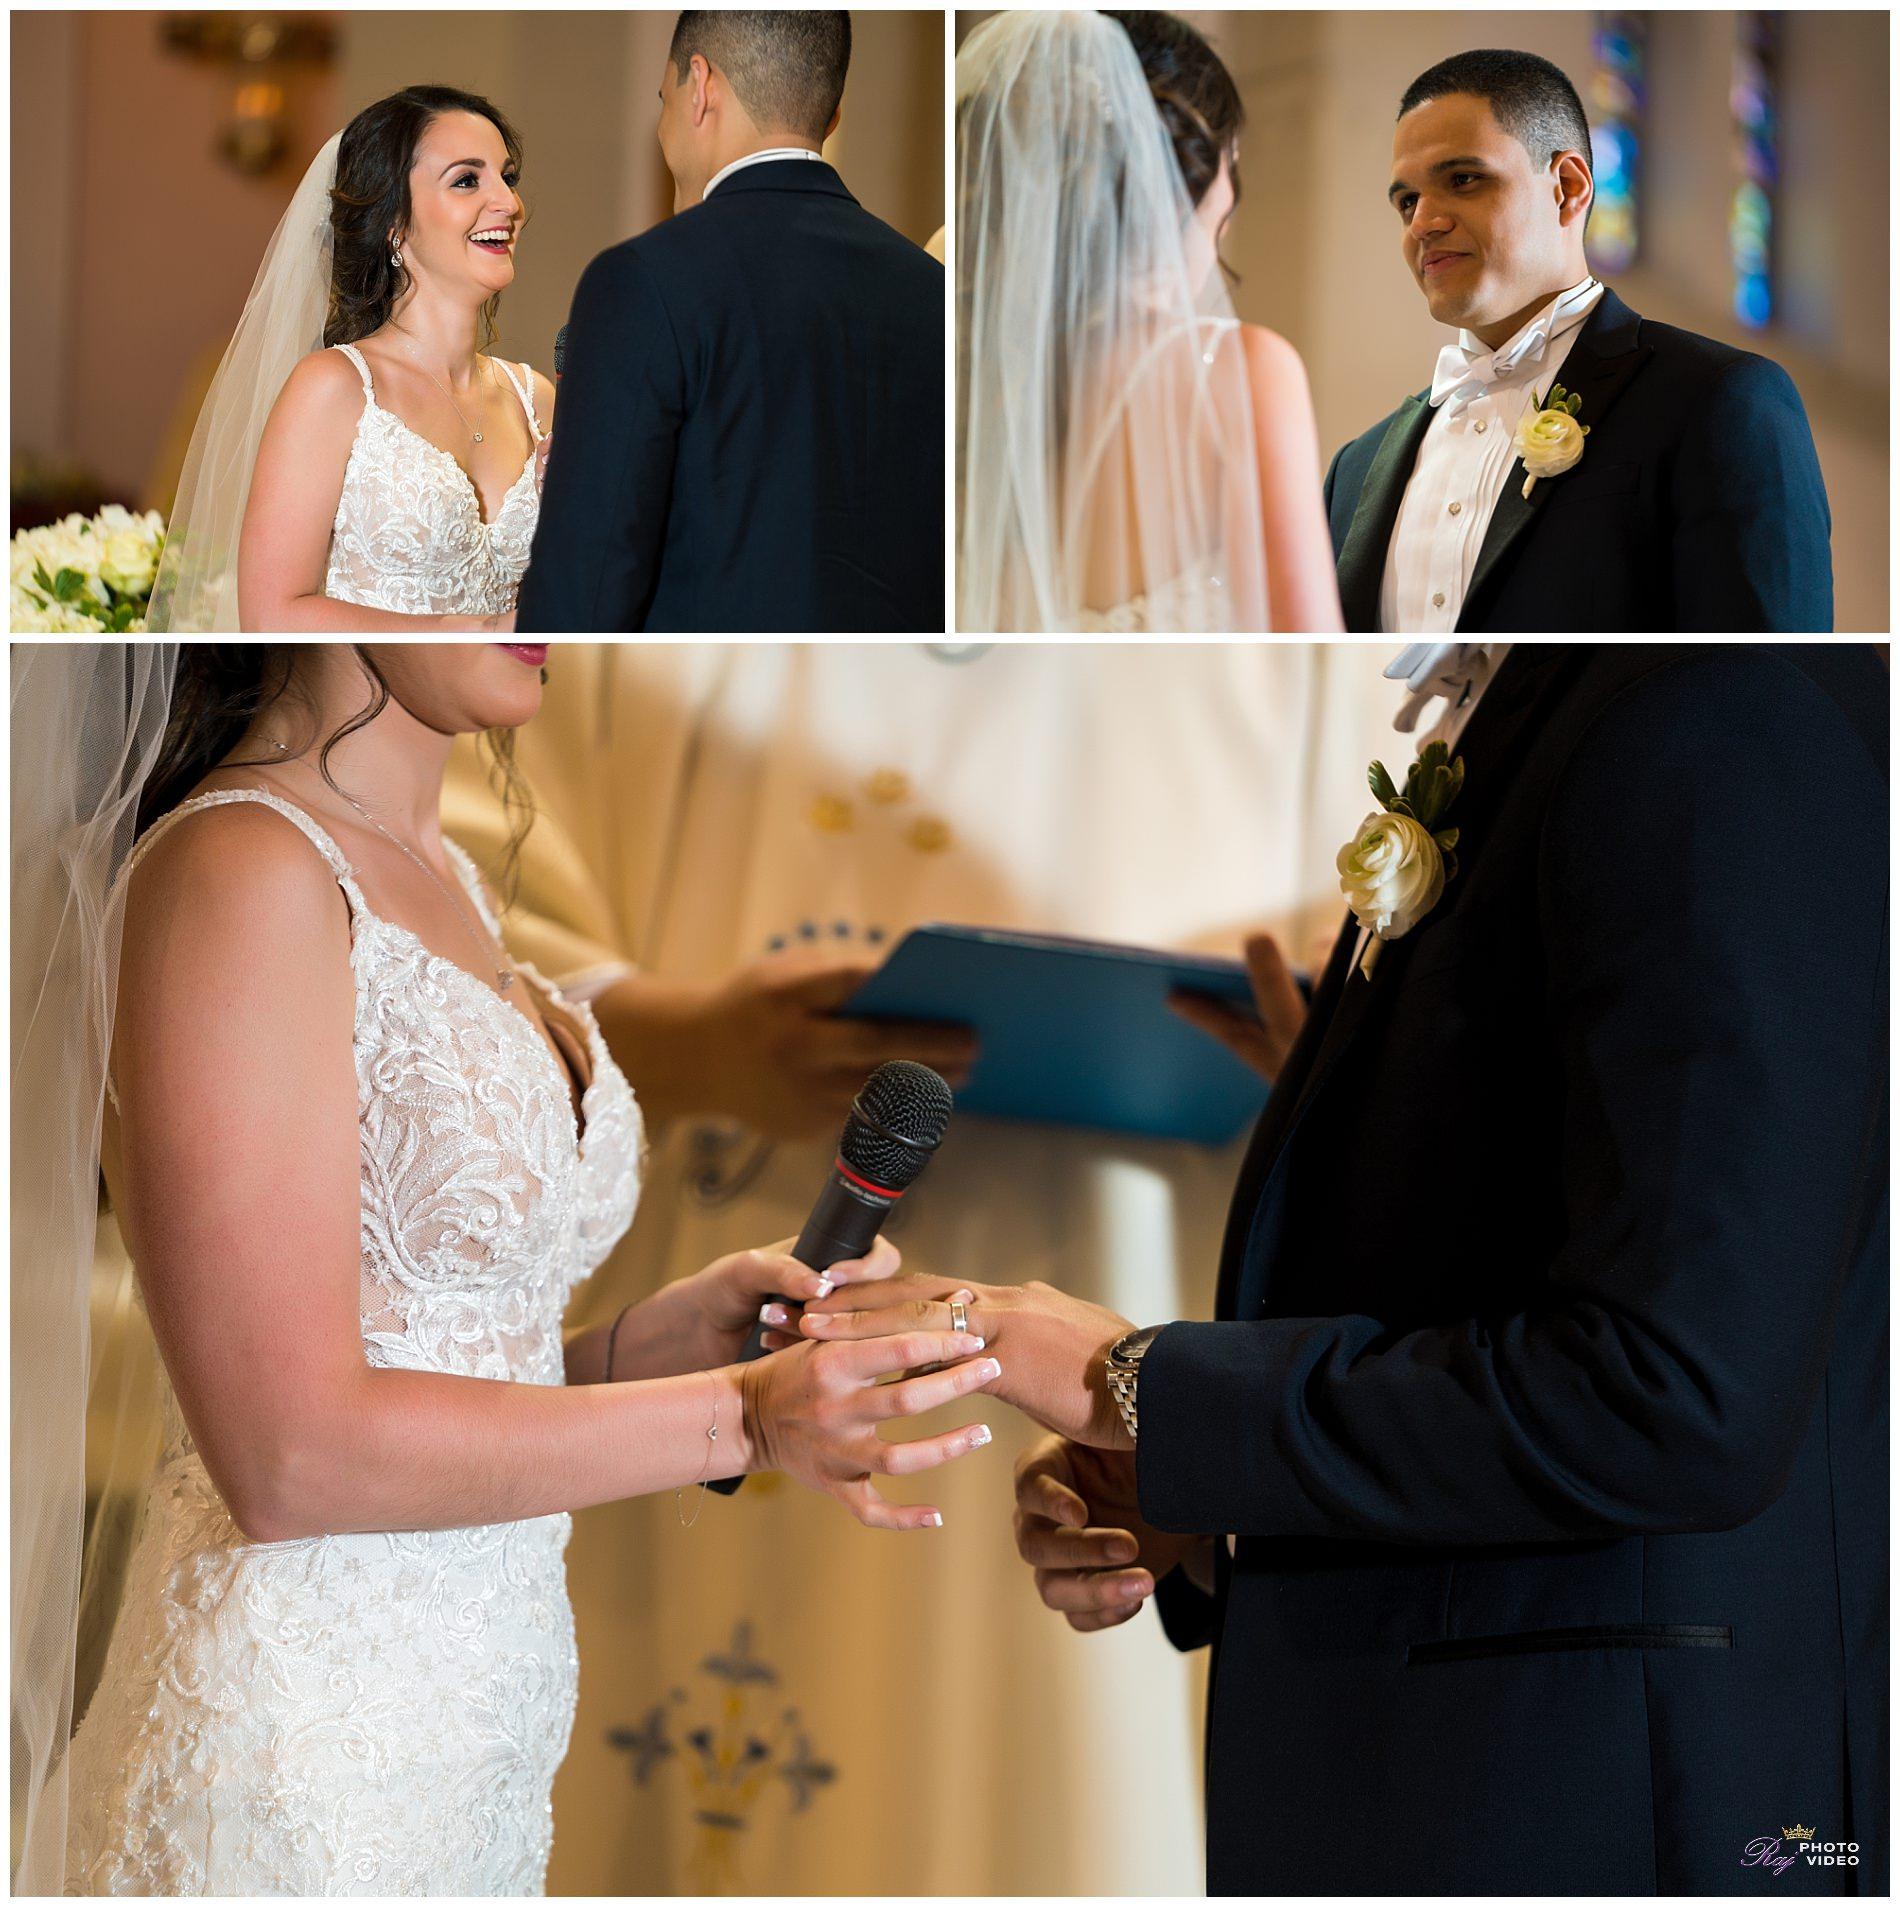 St-Valentines-Catholic-Church-Bloomfield-NJ-Wedding-Yanet-Jose-10.jpg